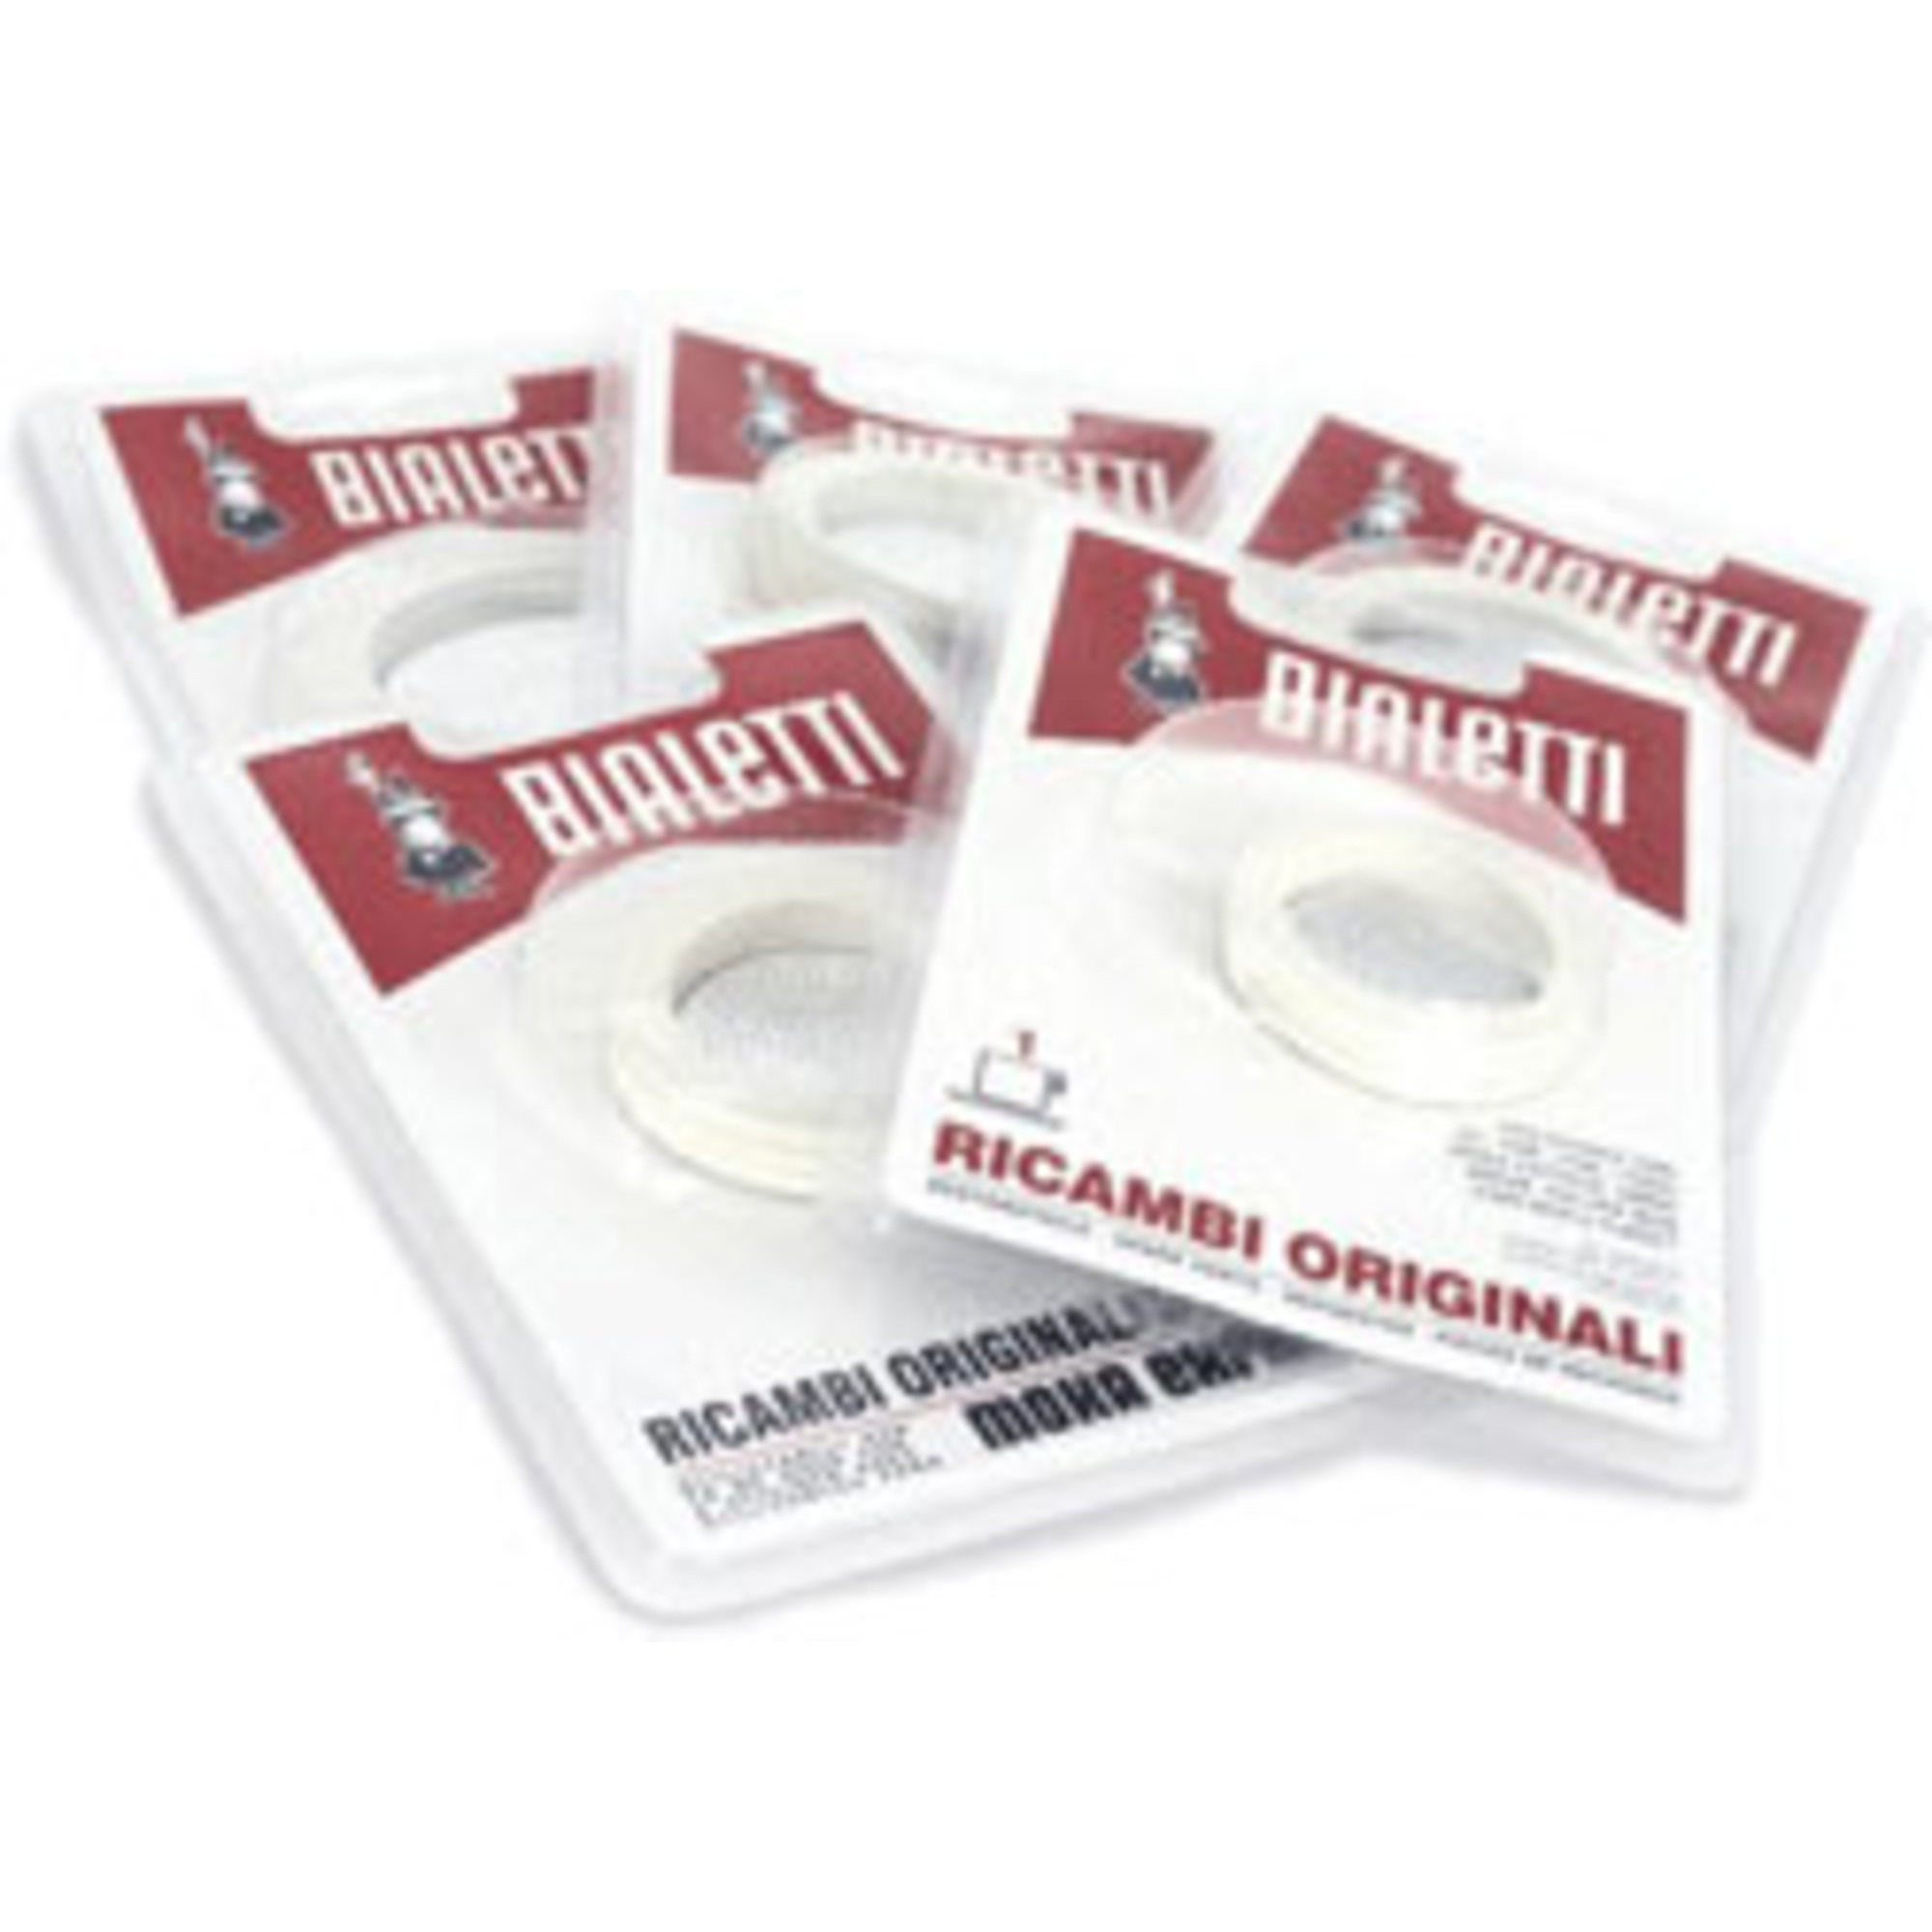 Bialetti Packningsset till Mokabryggare Aluminium 3-4 Koppars